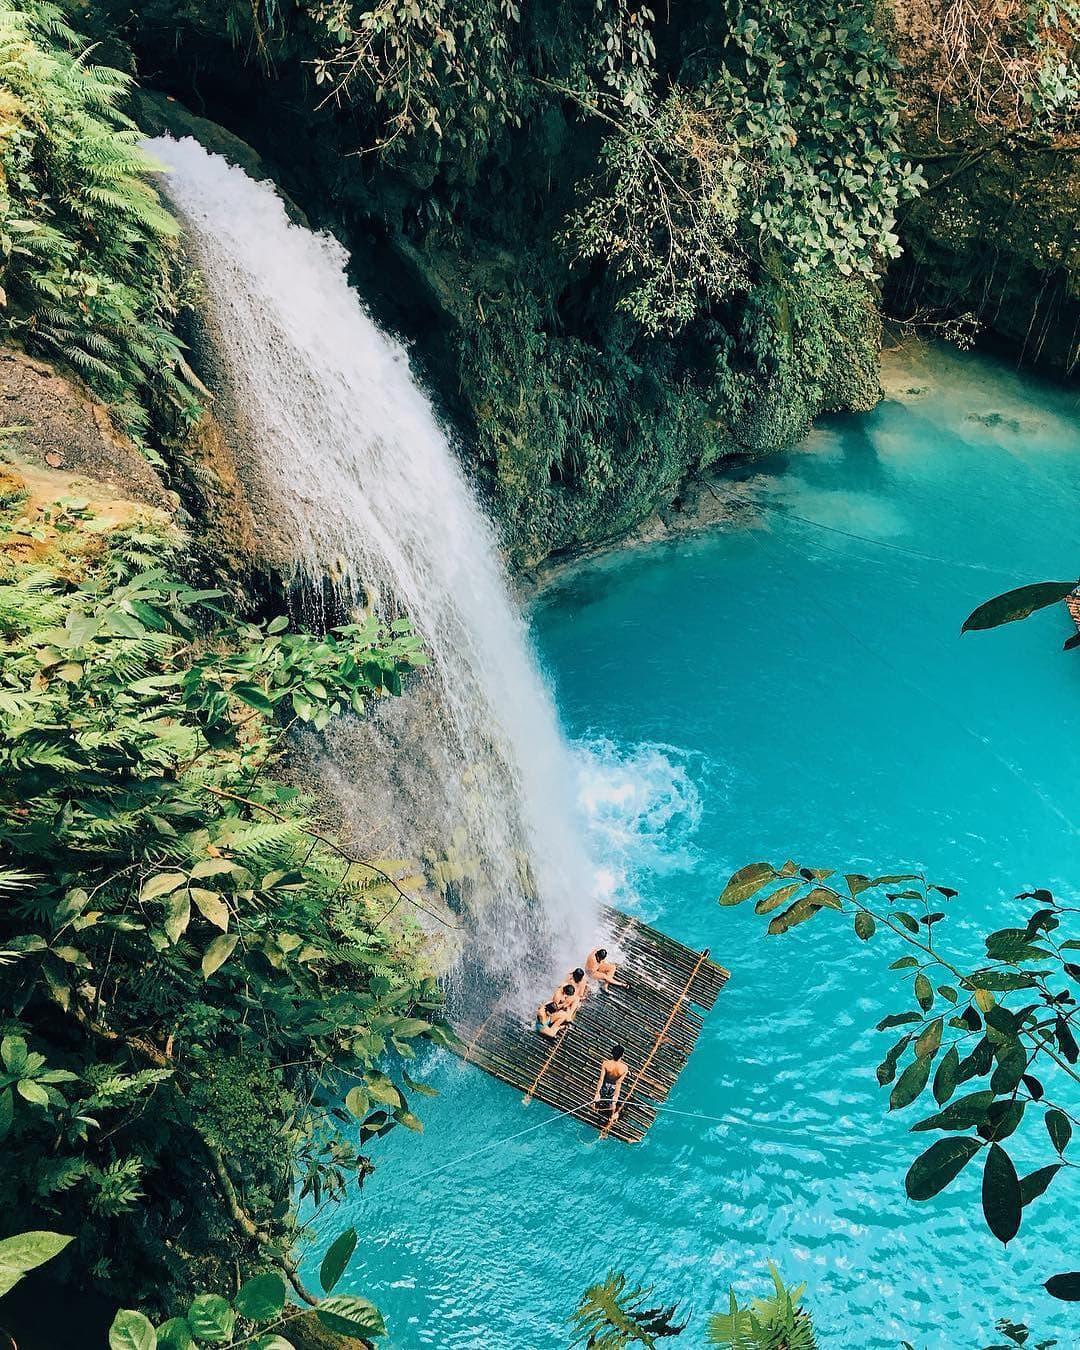 How To Get To Kawasan Falls From Cebu Oslob And Moalboal